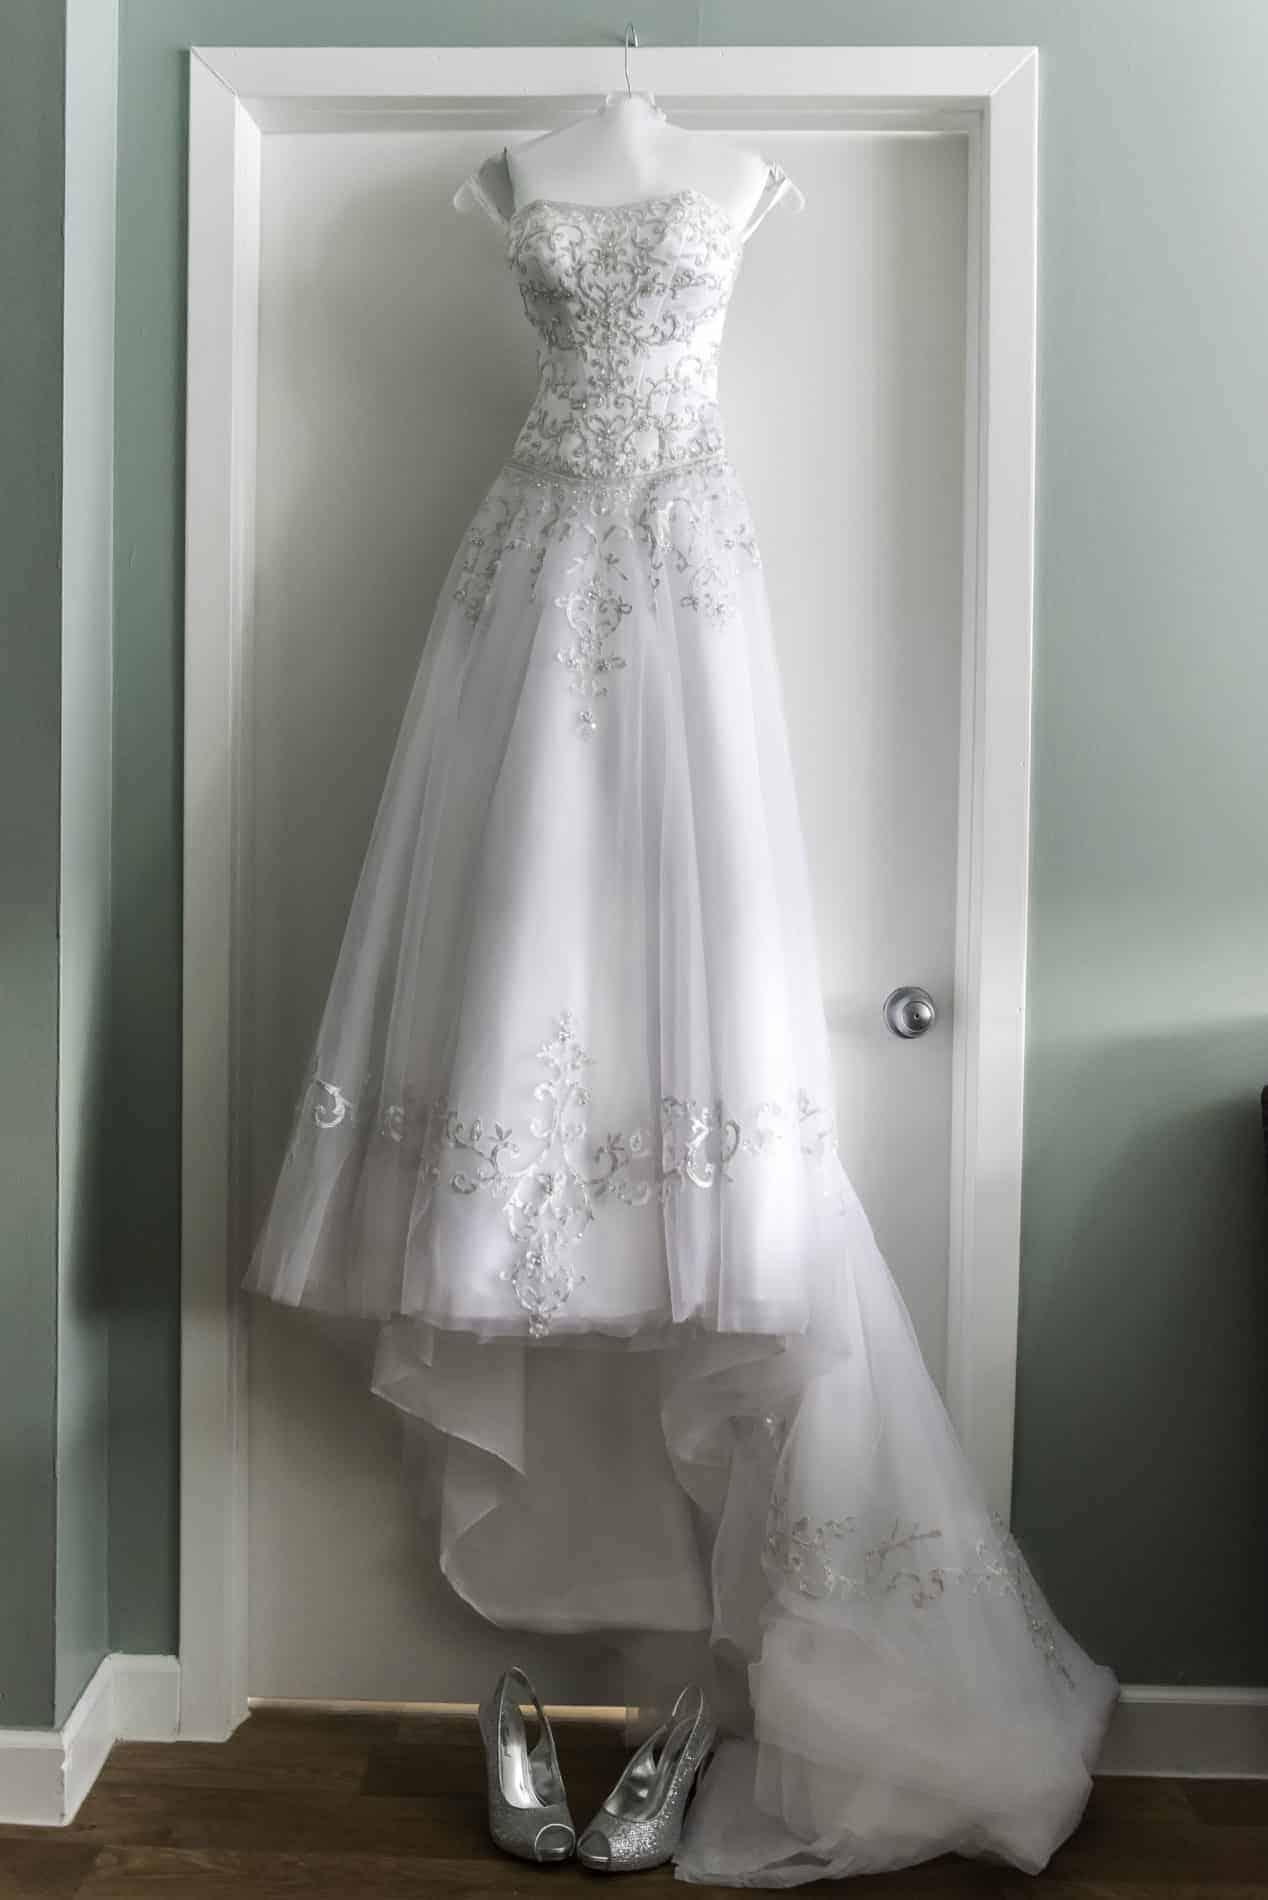 Beautiful Wedding Dress hanging on a door